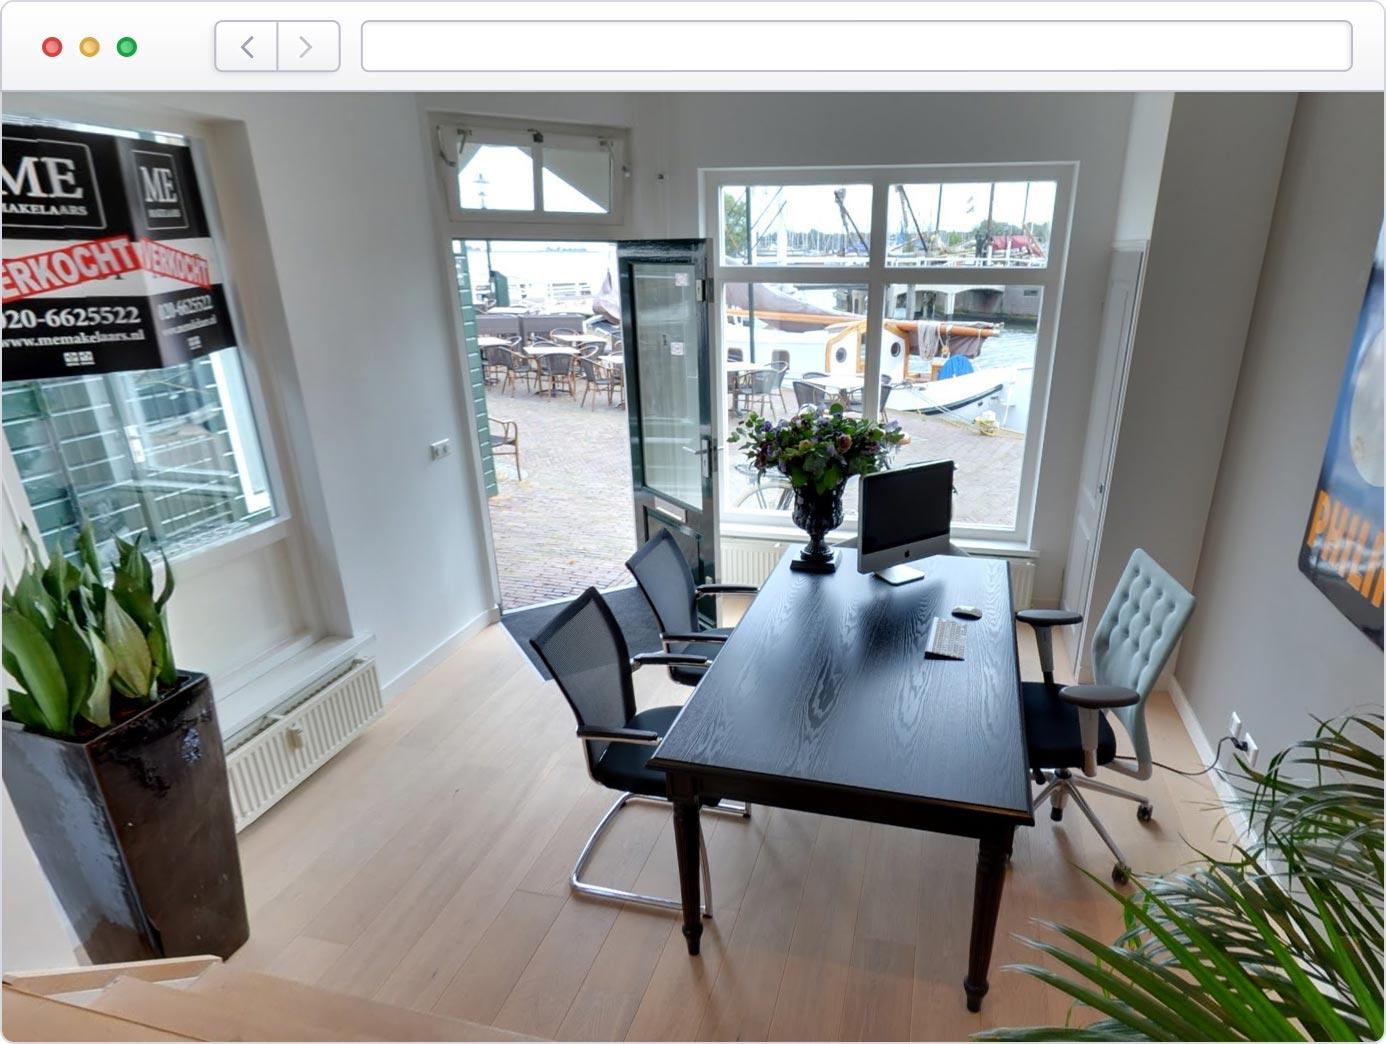 Virtuele tour van uw bureau op Google